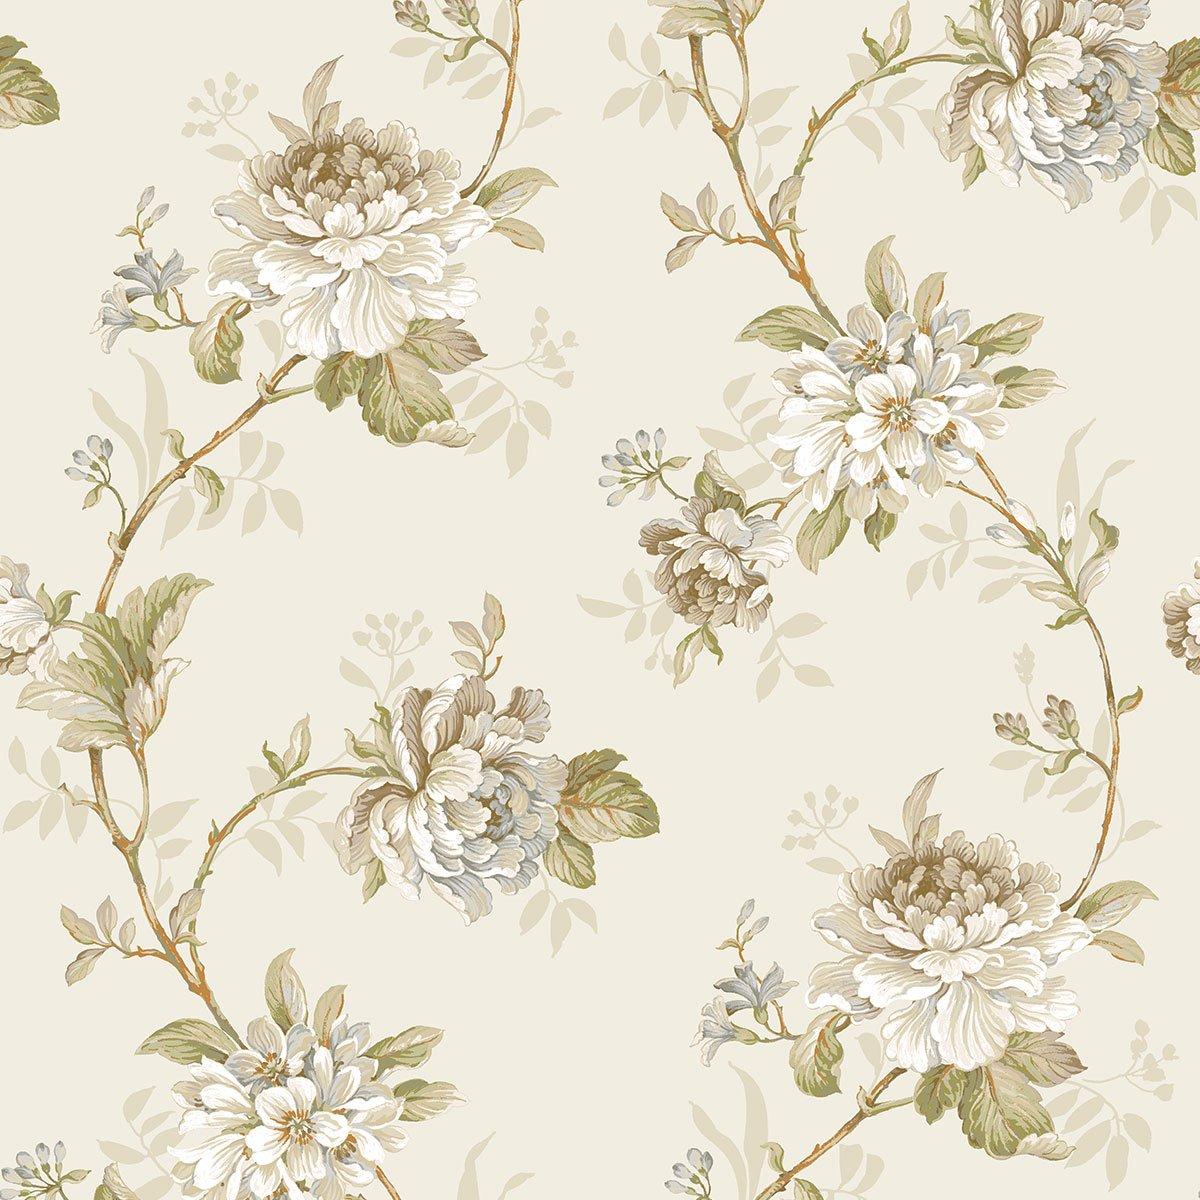 DansLemur 622-4 - Papel pintado TNT con flor rameada, color beige ICH SL